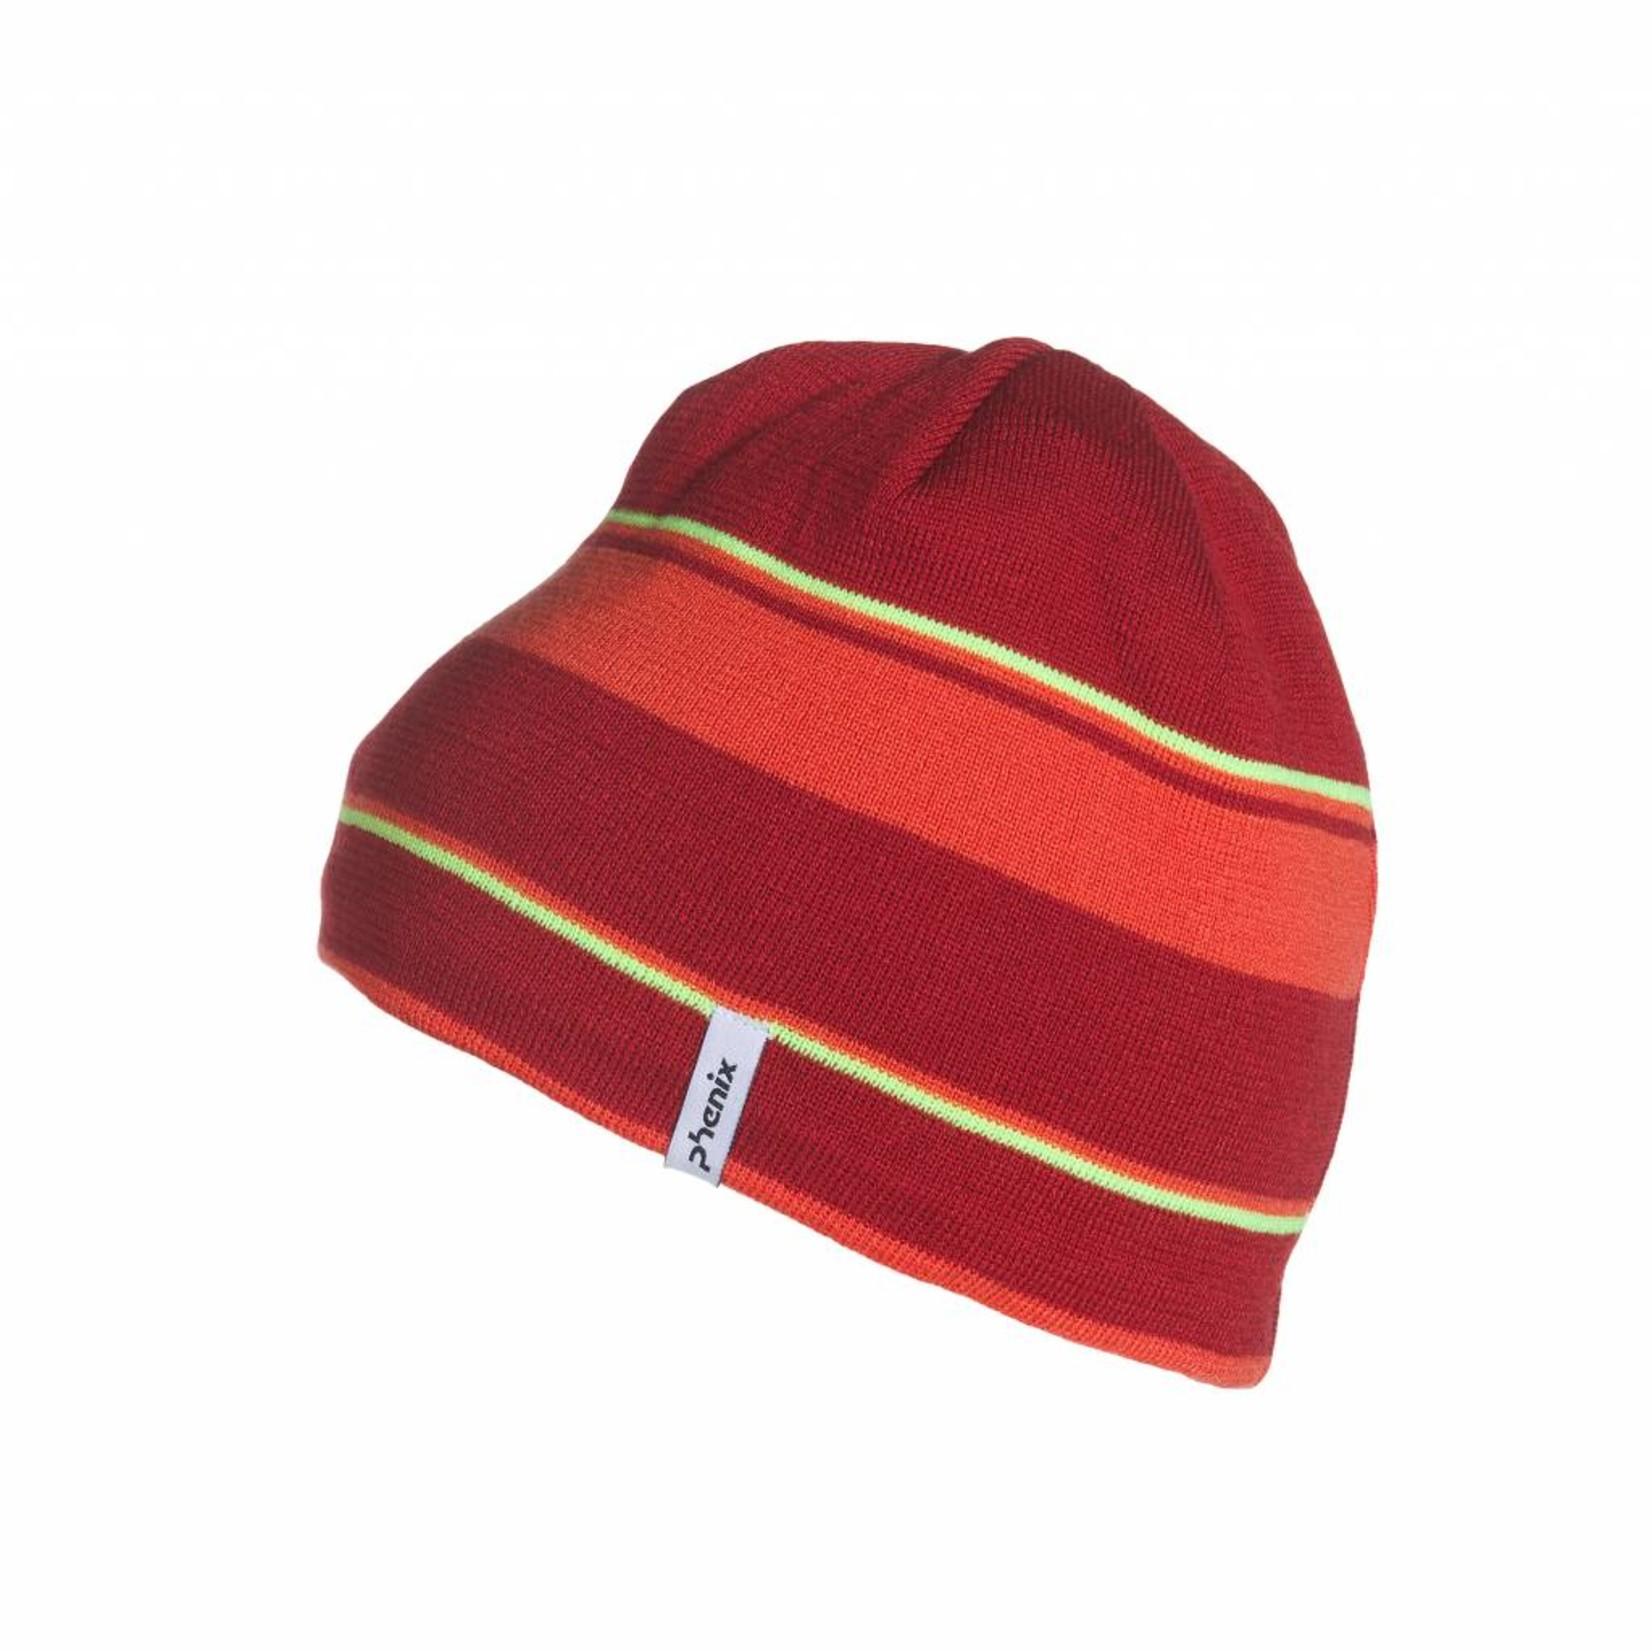 PHENIX Stylizher Knit Hat Men - DR